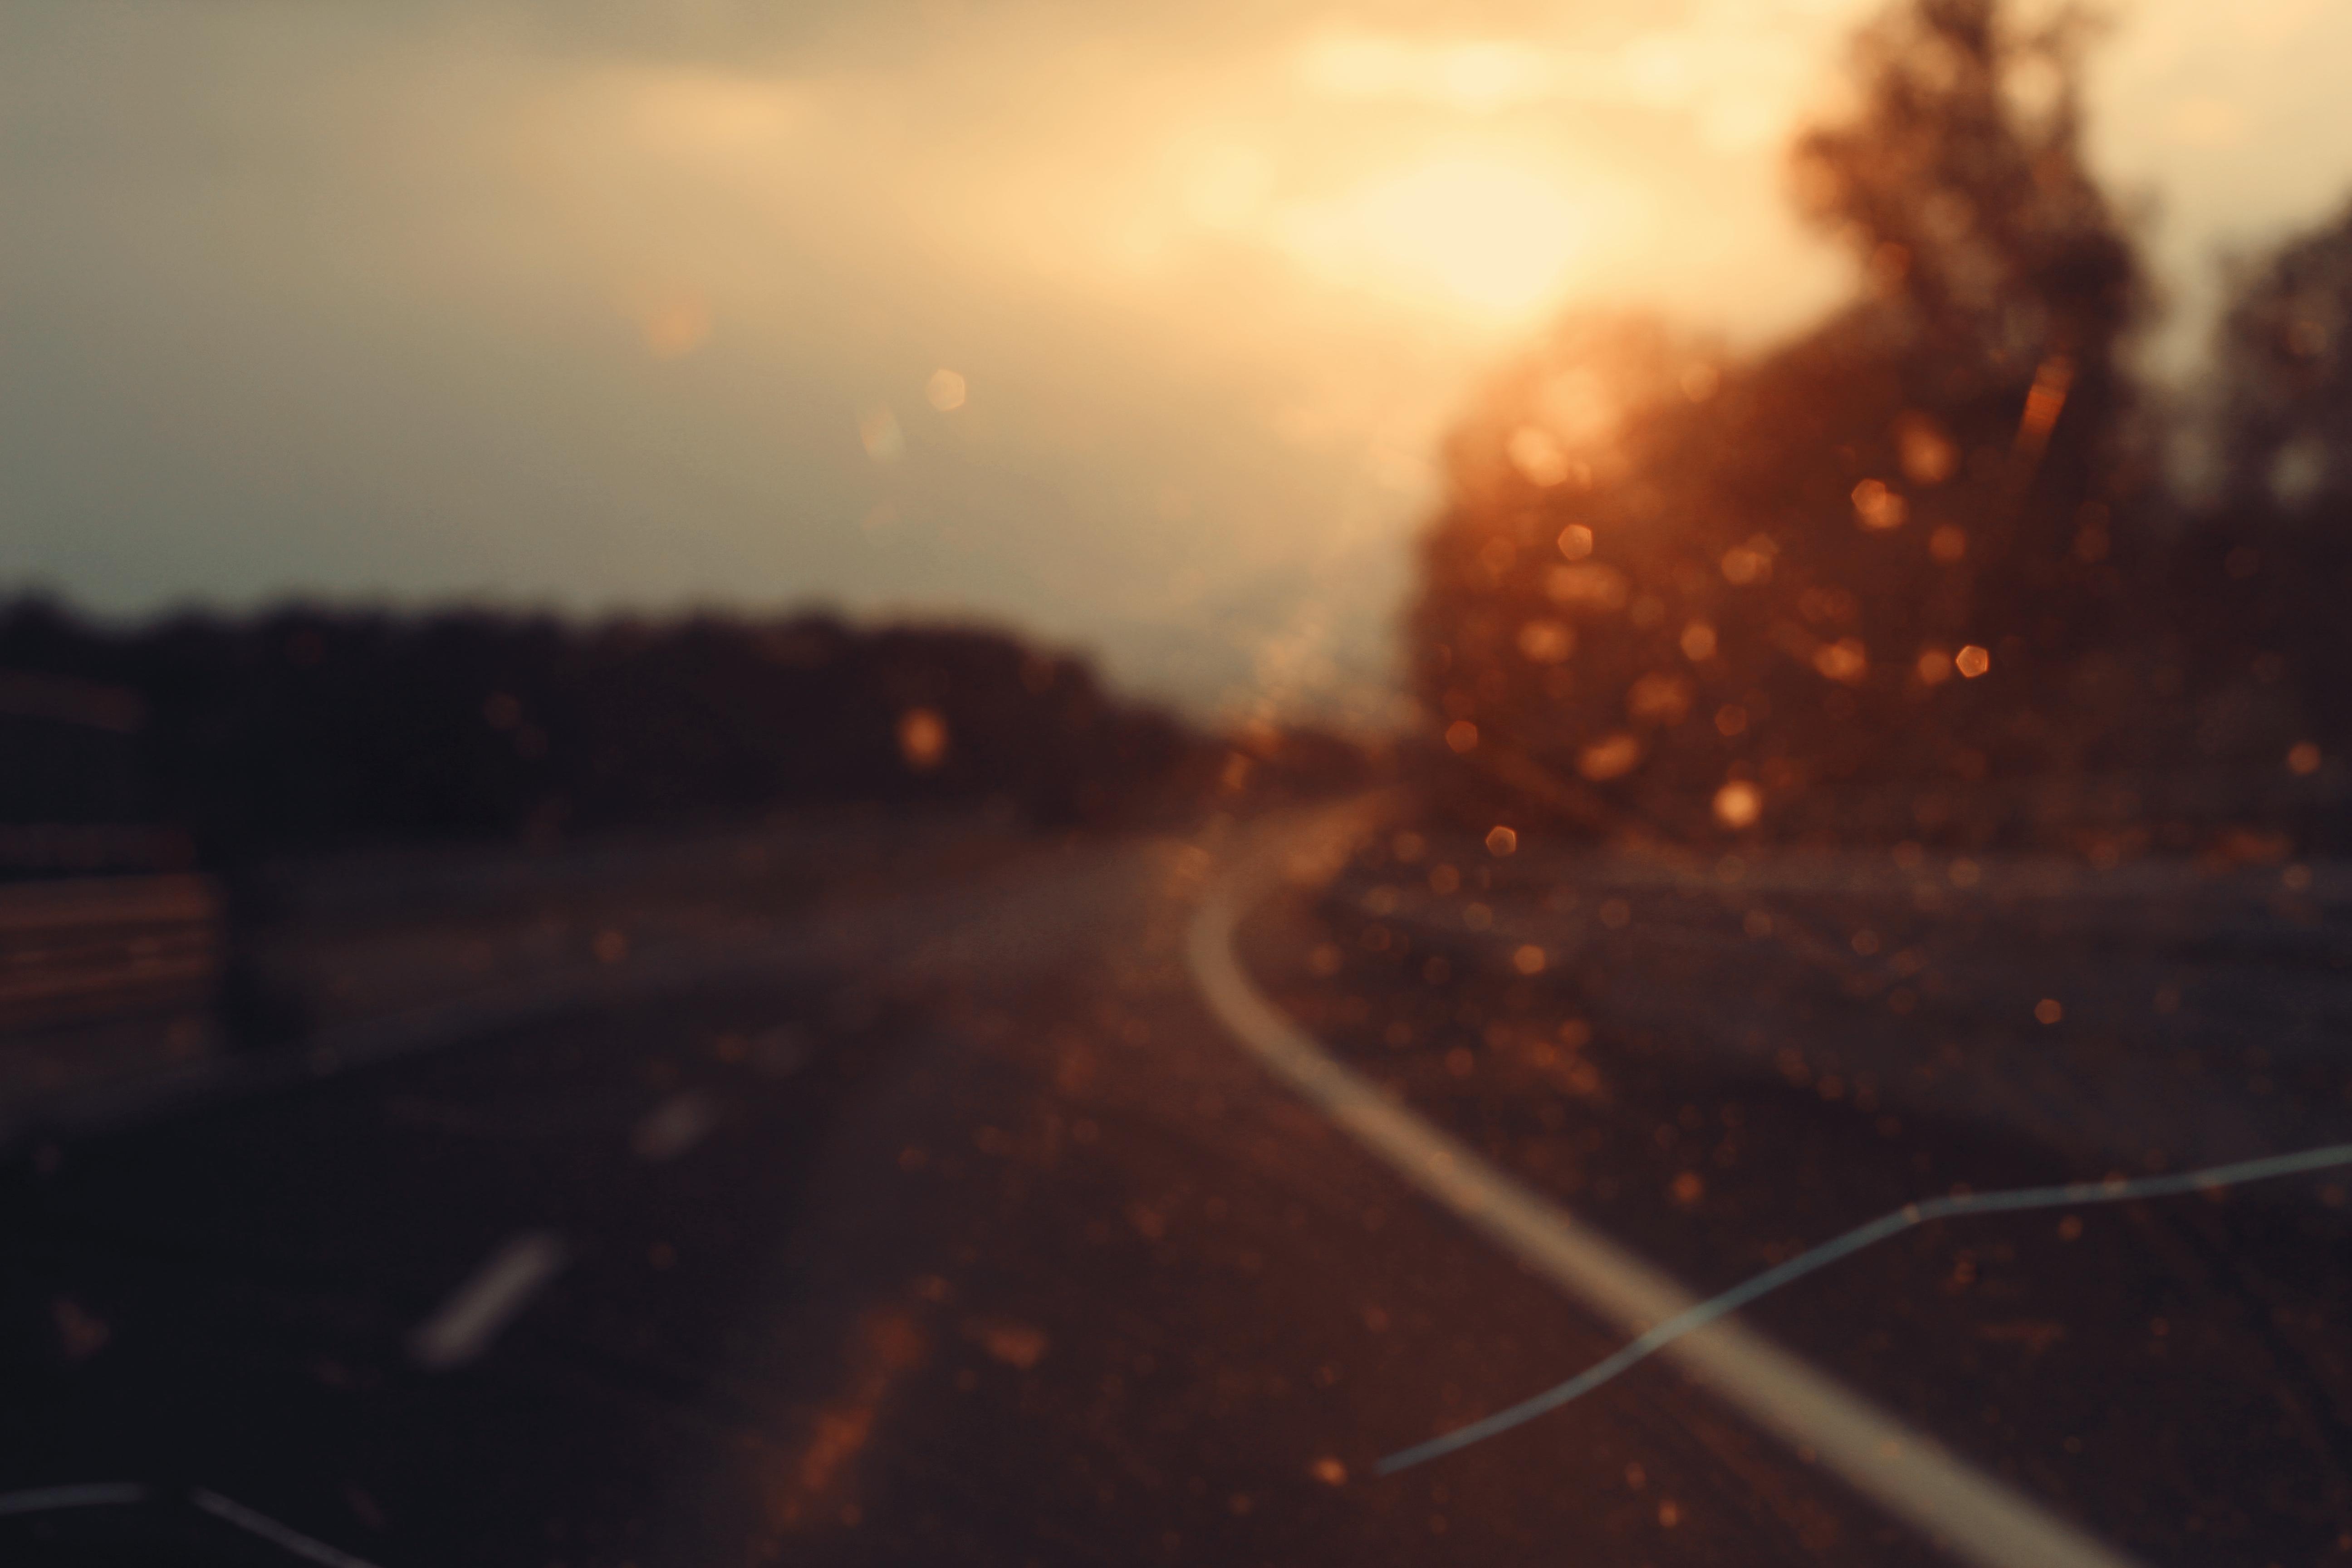 Background image blur - Free Stock Photo Of Street Car Vehicle Blur